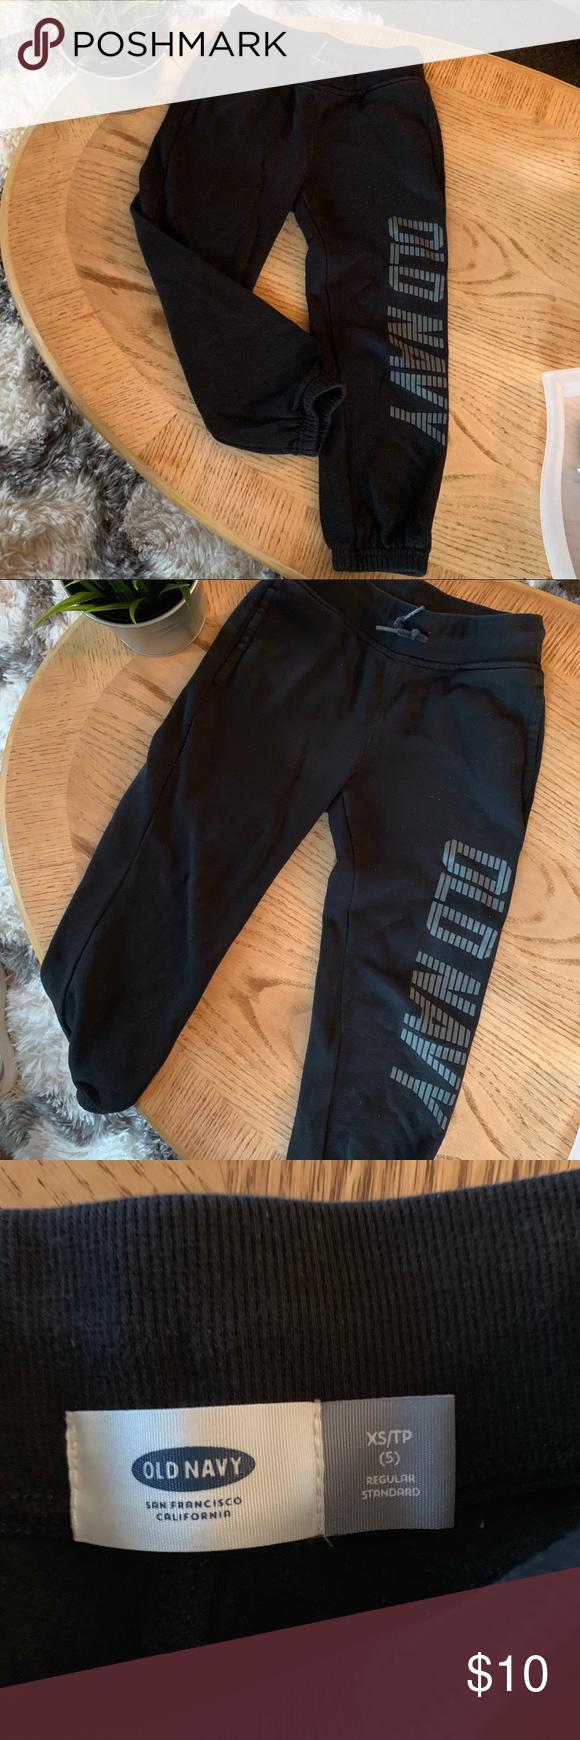 OLD NAVY boys sweat pants🔵 Pants, Black sweatpants